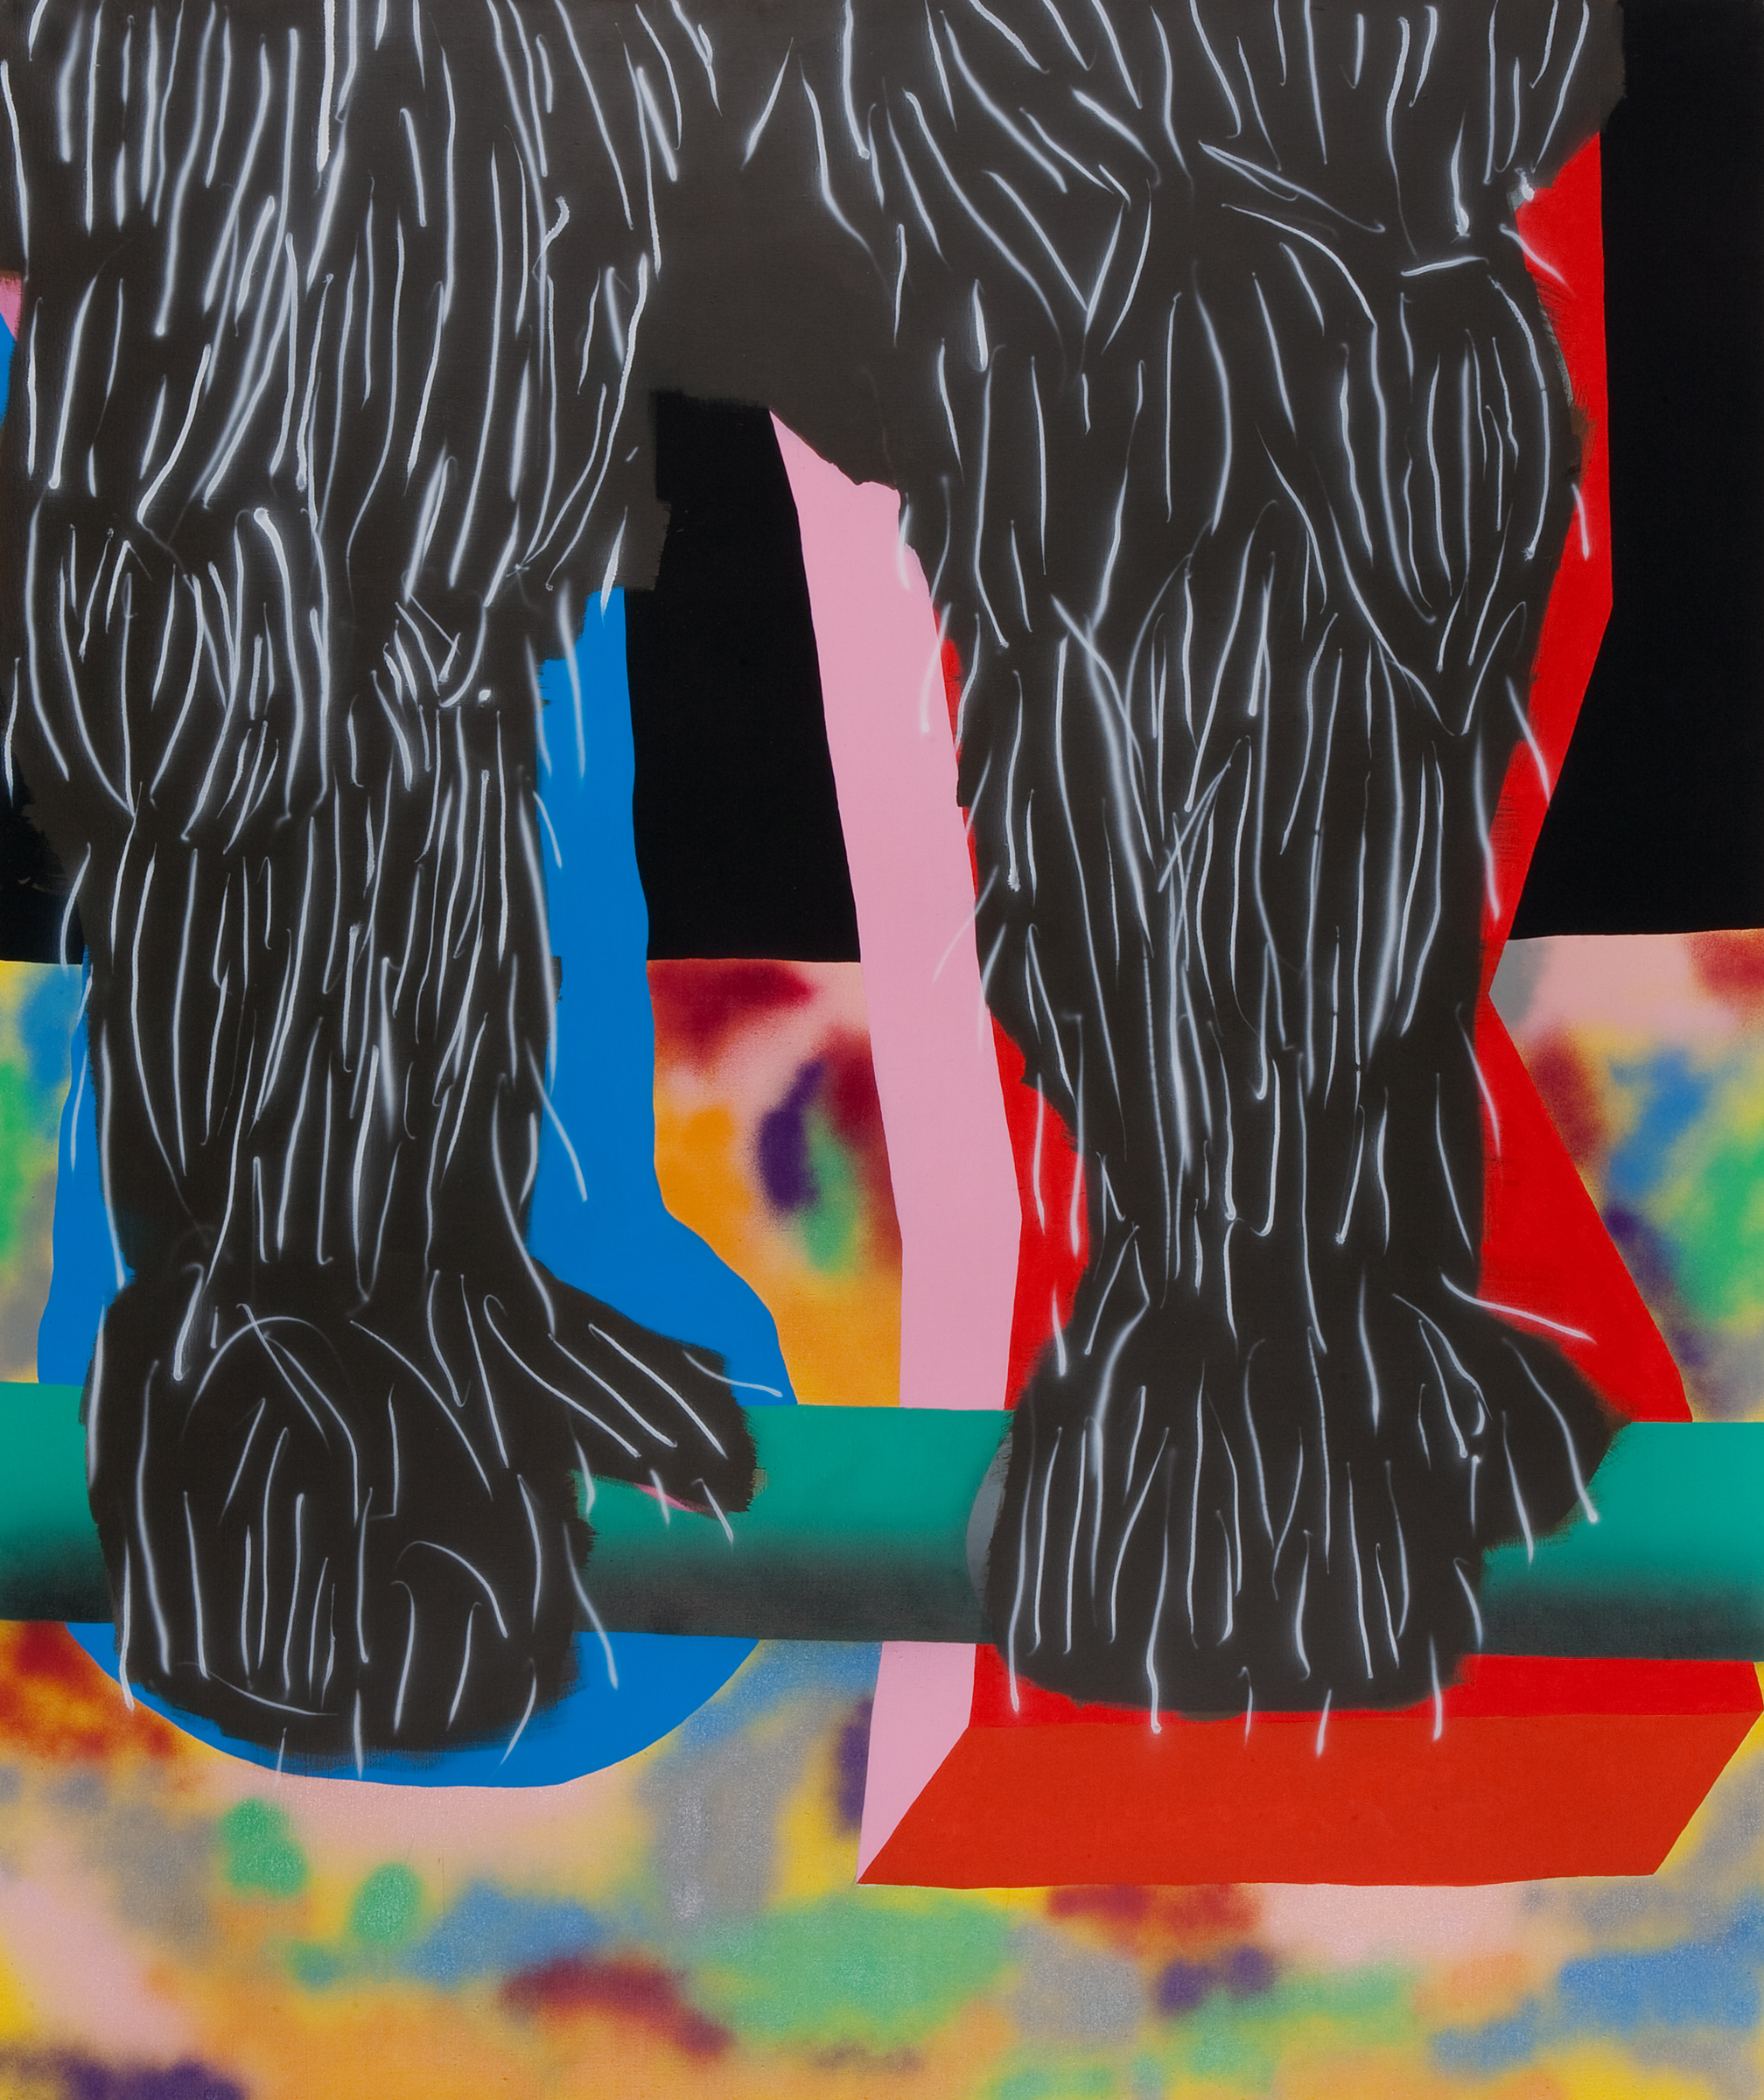 Tribulus Terestis II. 2008, acrylic on canvas, 240 x 200 cm